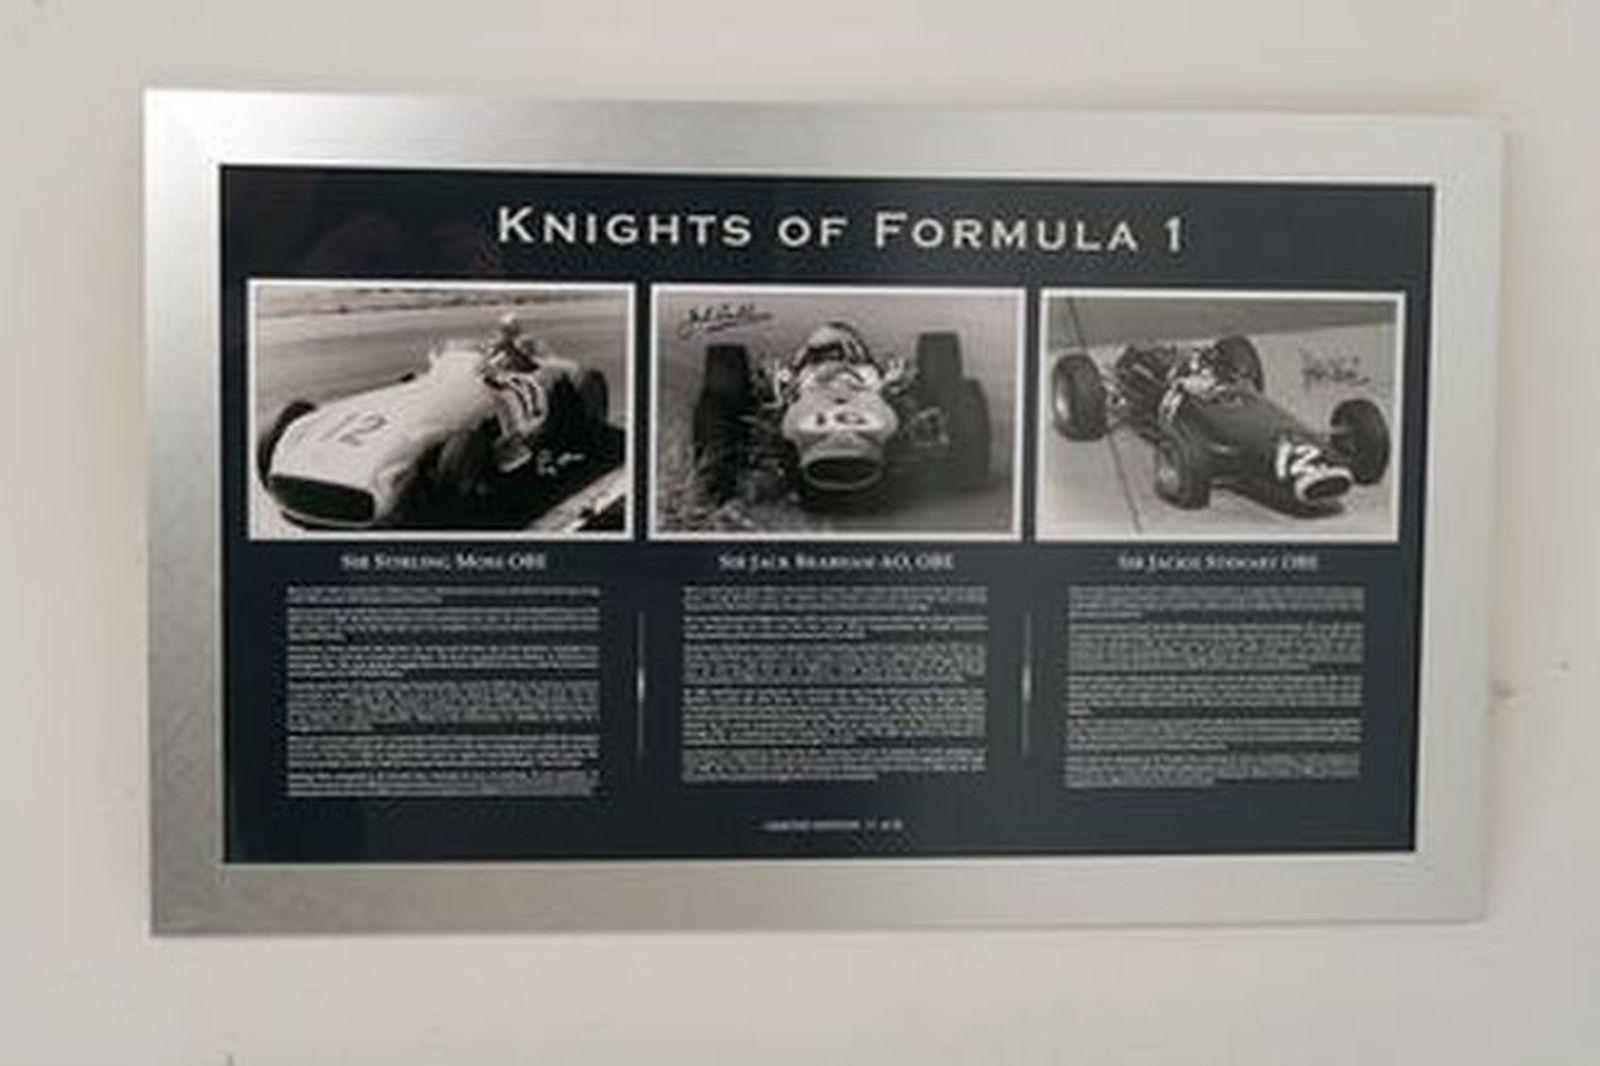 Framed Signed Photos - 'Knights of Formula 1' signed by Stirling Moss, Jack Brabham & Jackie Stewart